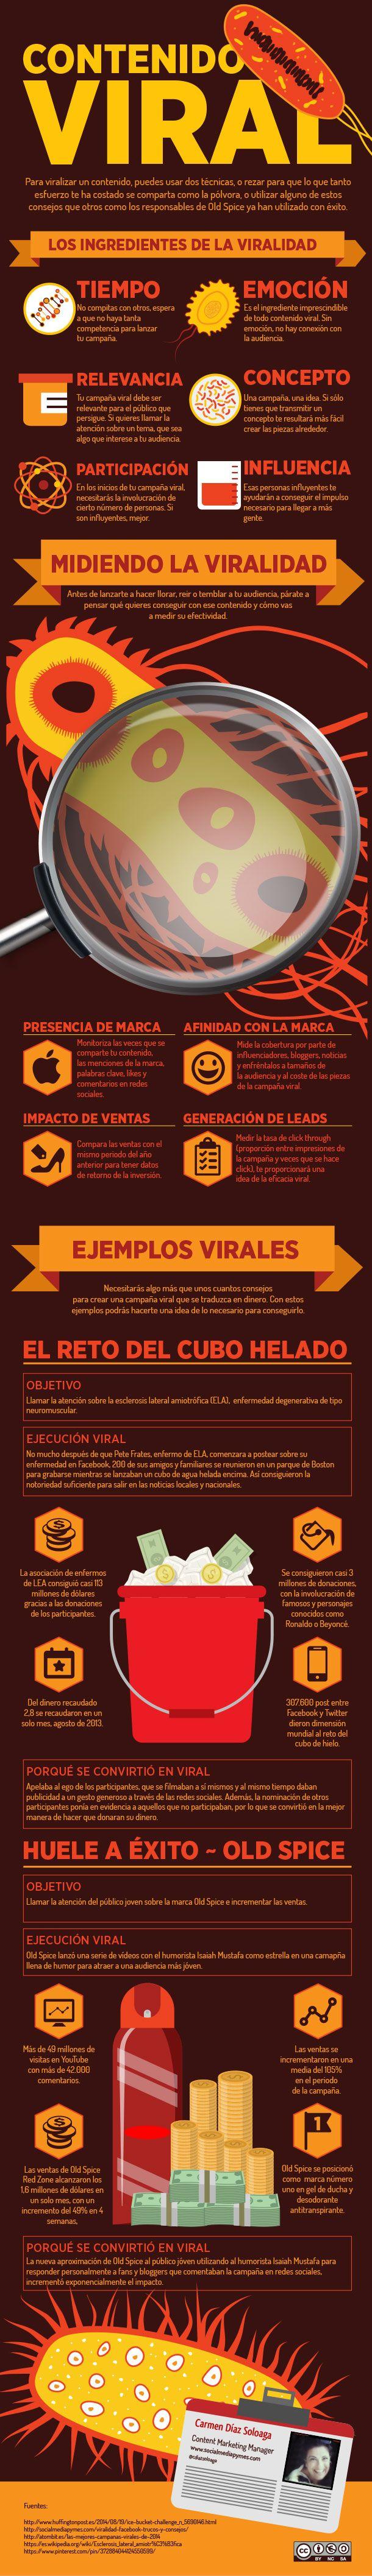 contenido-viral.jpg (610×4229)